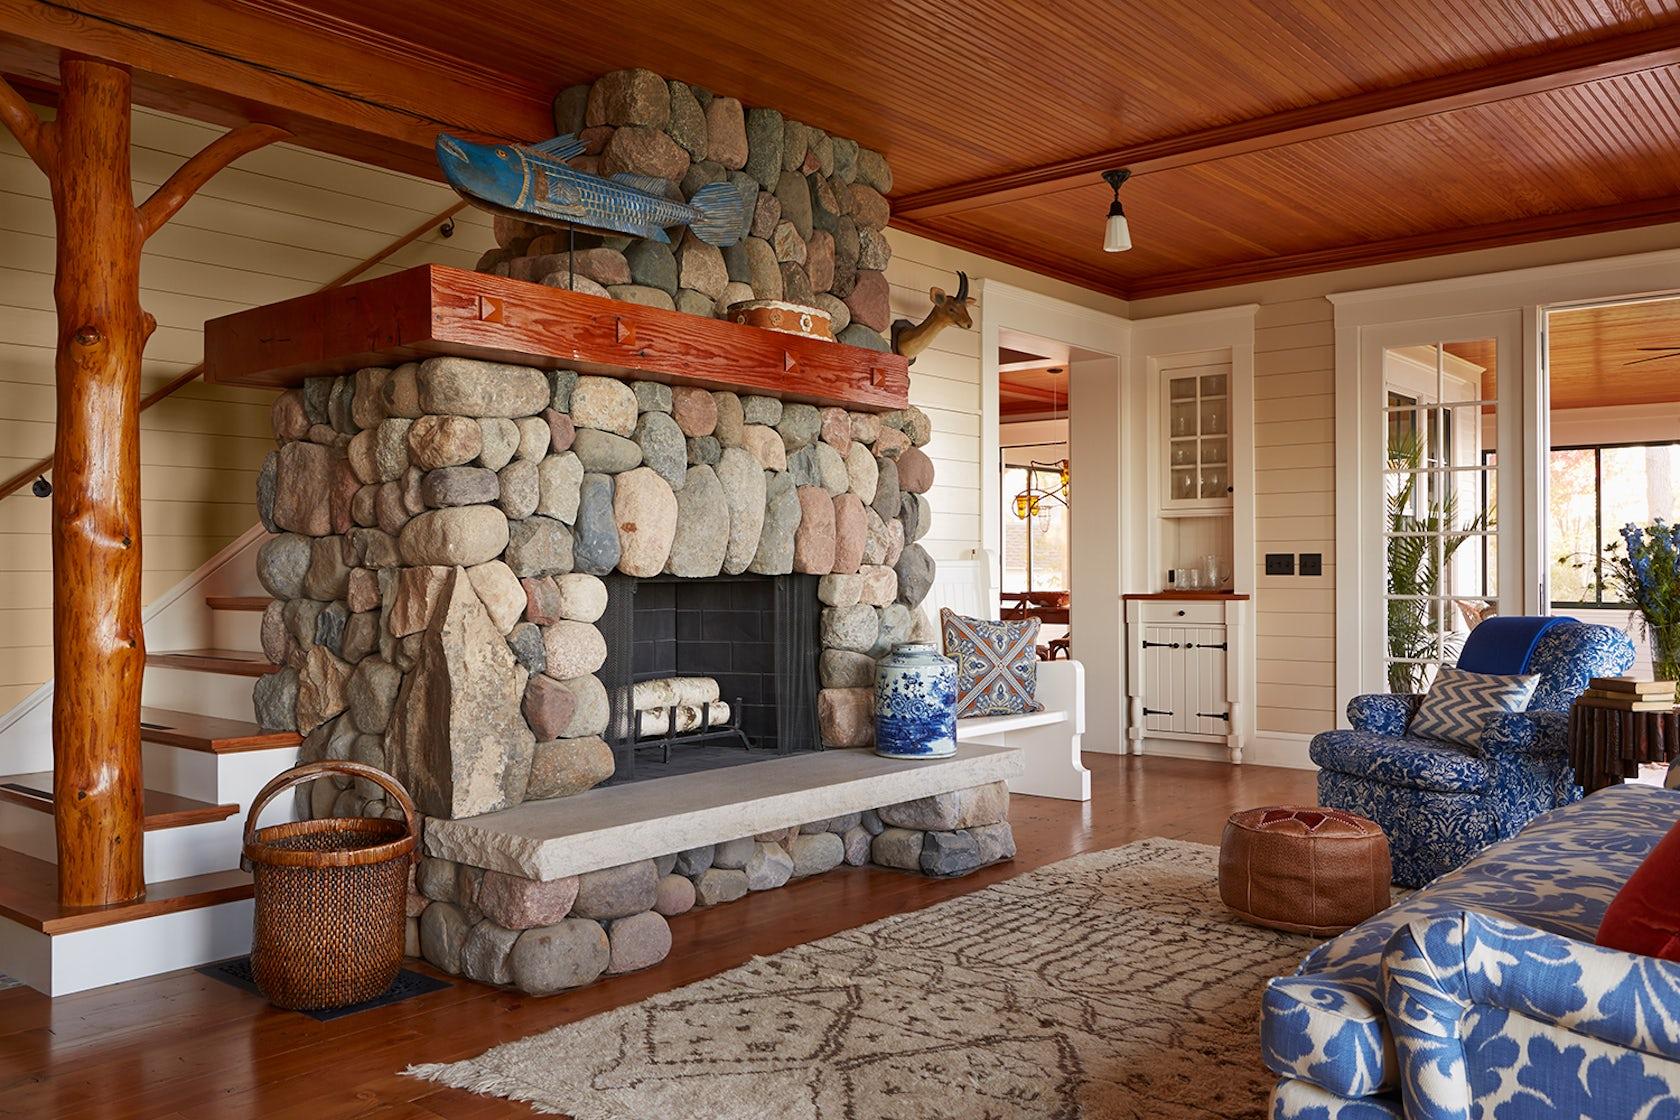 100+ [ Home Design Expo ] | Home Design Make Your Life Perfect ...